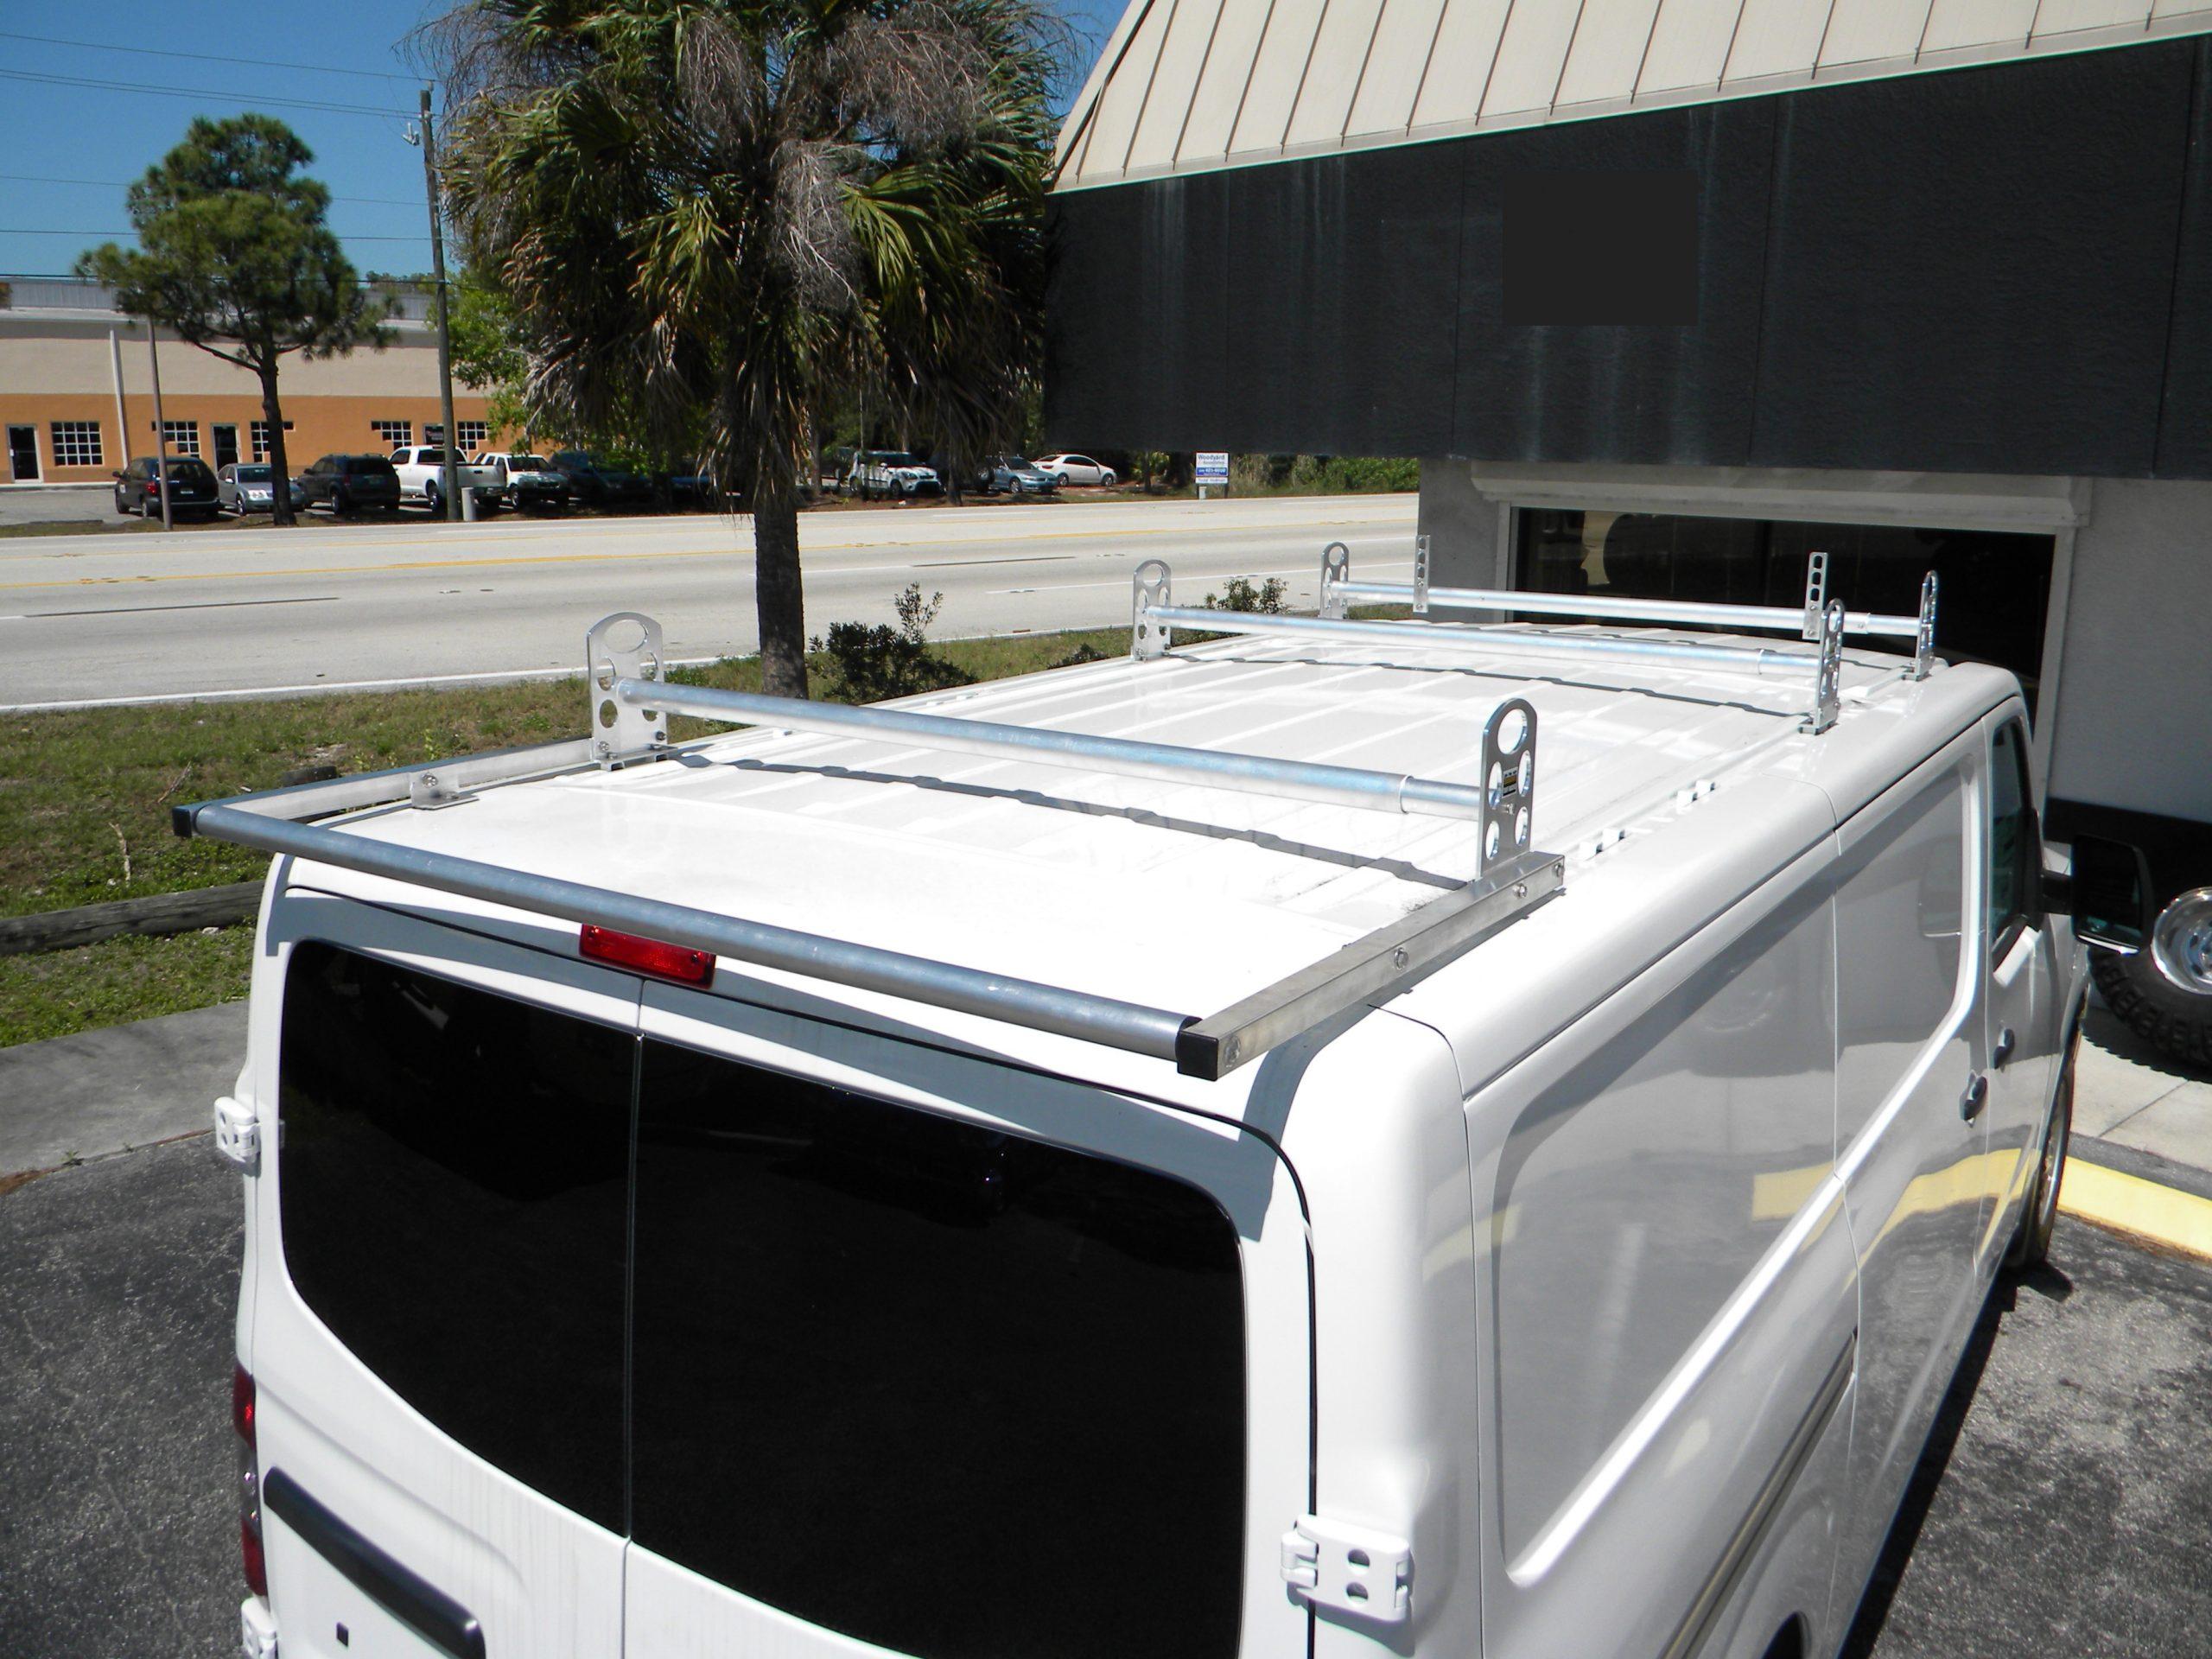 nissan nv cargo high top or low top ladder racks 3 bar w roller